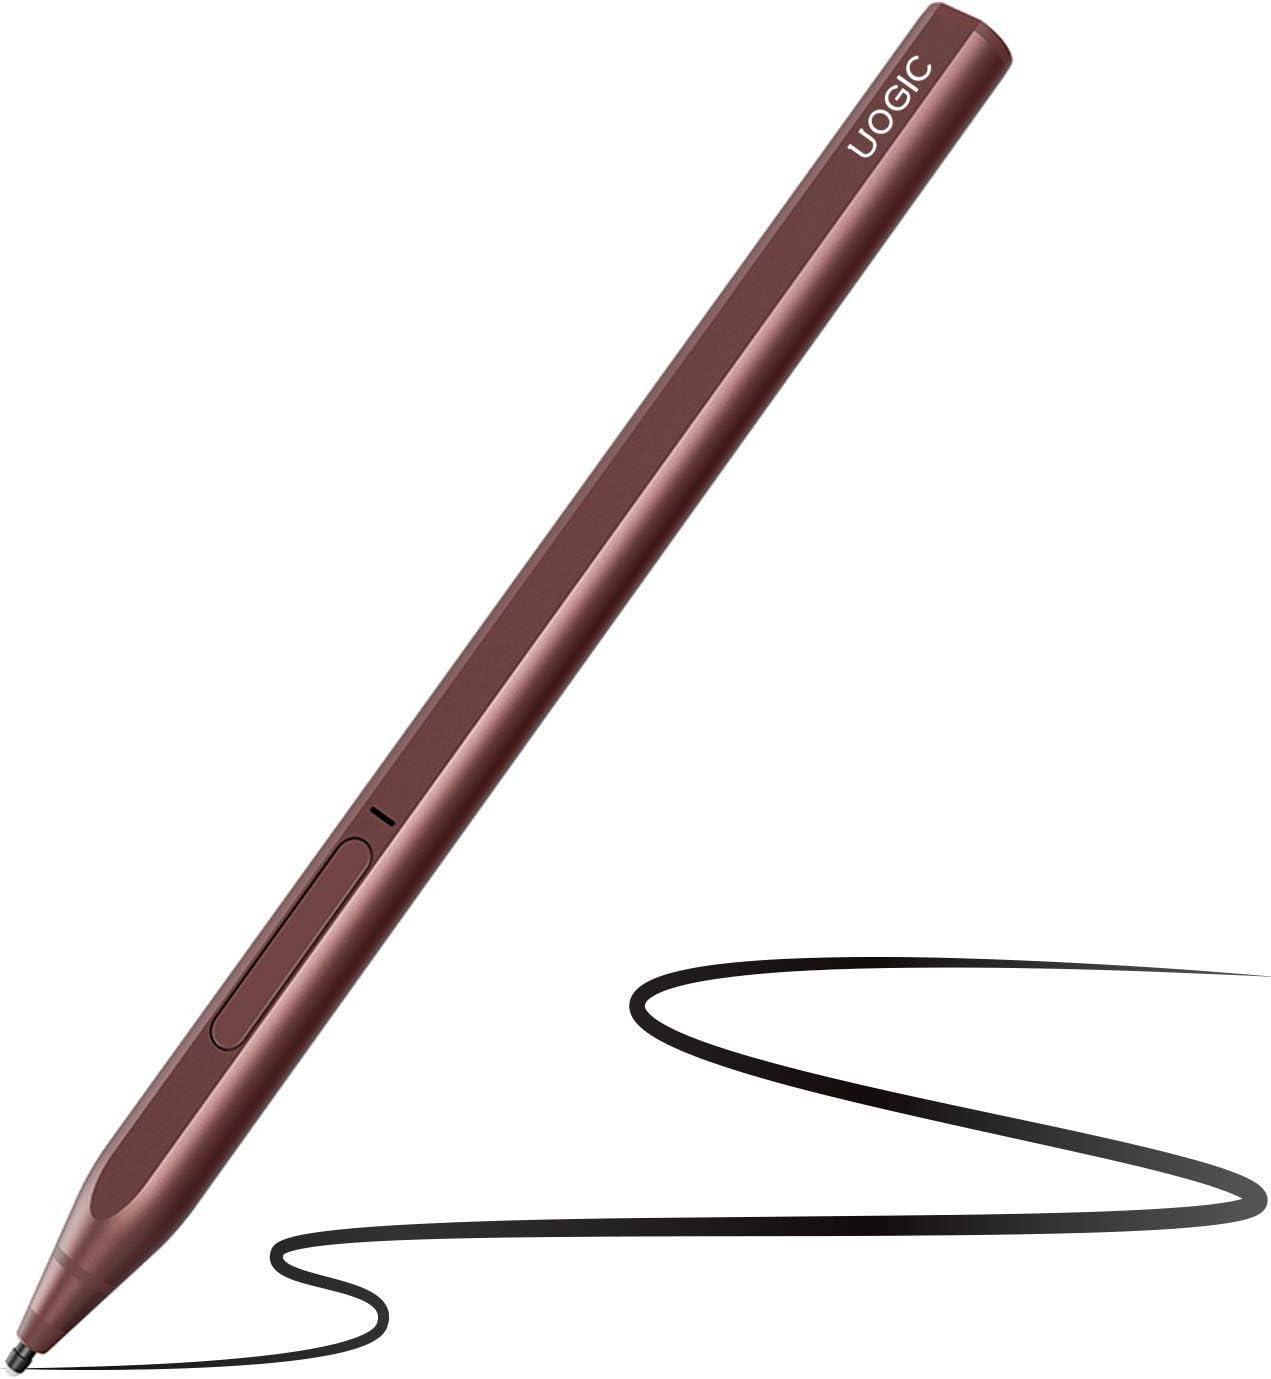 Uogic Pen for Microsoft Surface, Ink 581 Magnetic Stylus Pen, 4096 Pressure Sensitivity, Tilt & Palm Rejection, Flex & Soft HB Tip, for Surface Pro/Go/Book/Studio/Laptop Series, Rechargeable